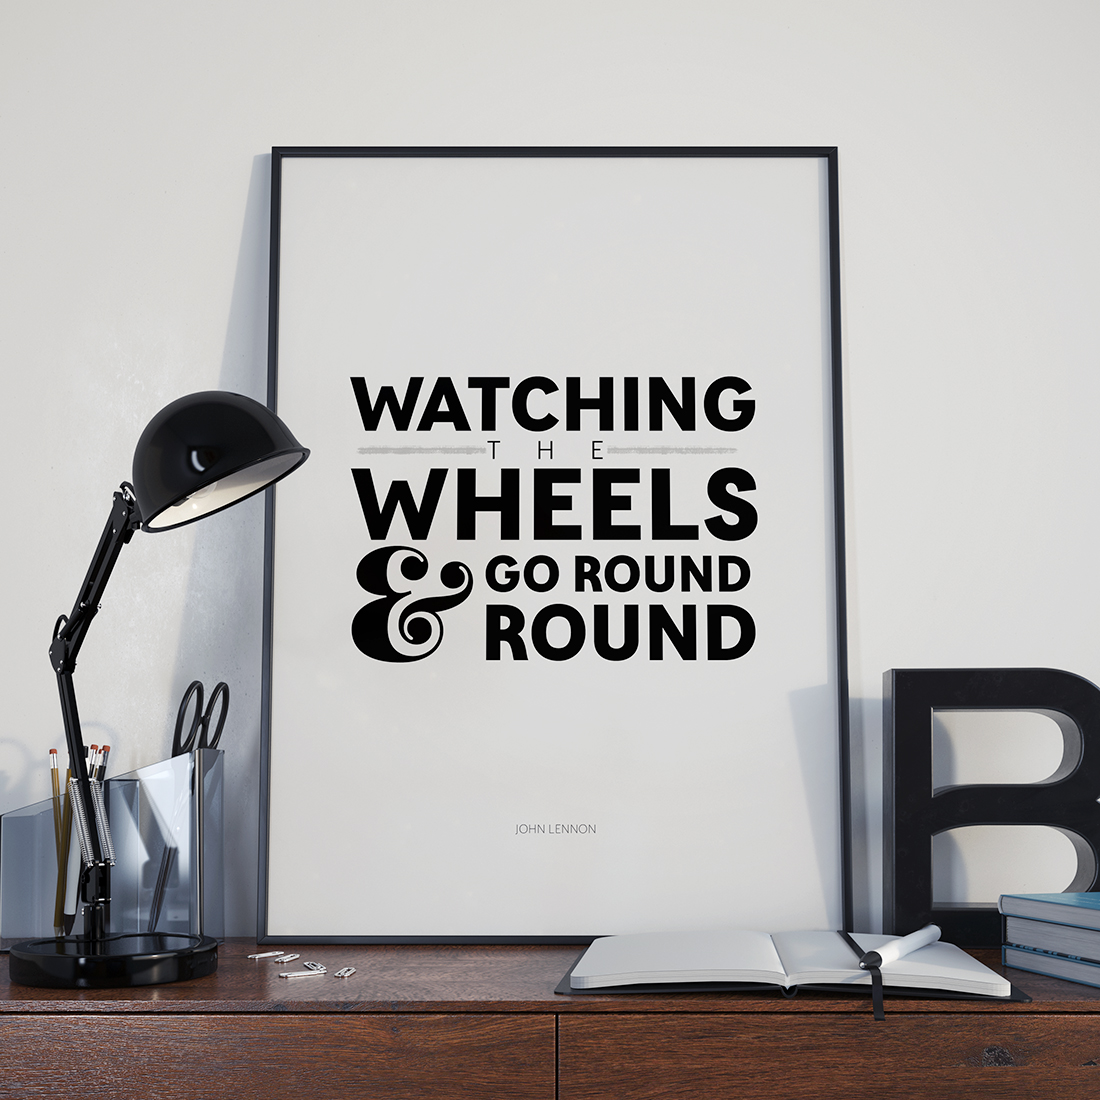 John Lennon Watching the Wheels Art Printable • Little Gold Pixel • shoplittlegoldpixel.com